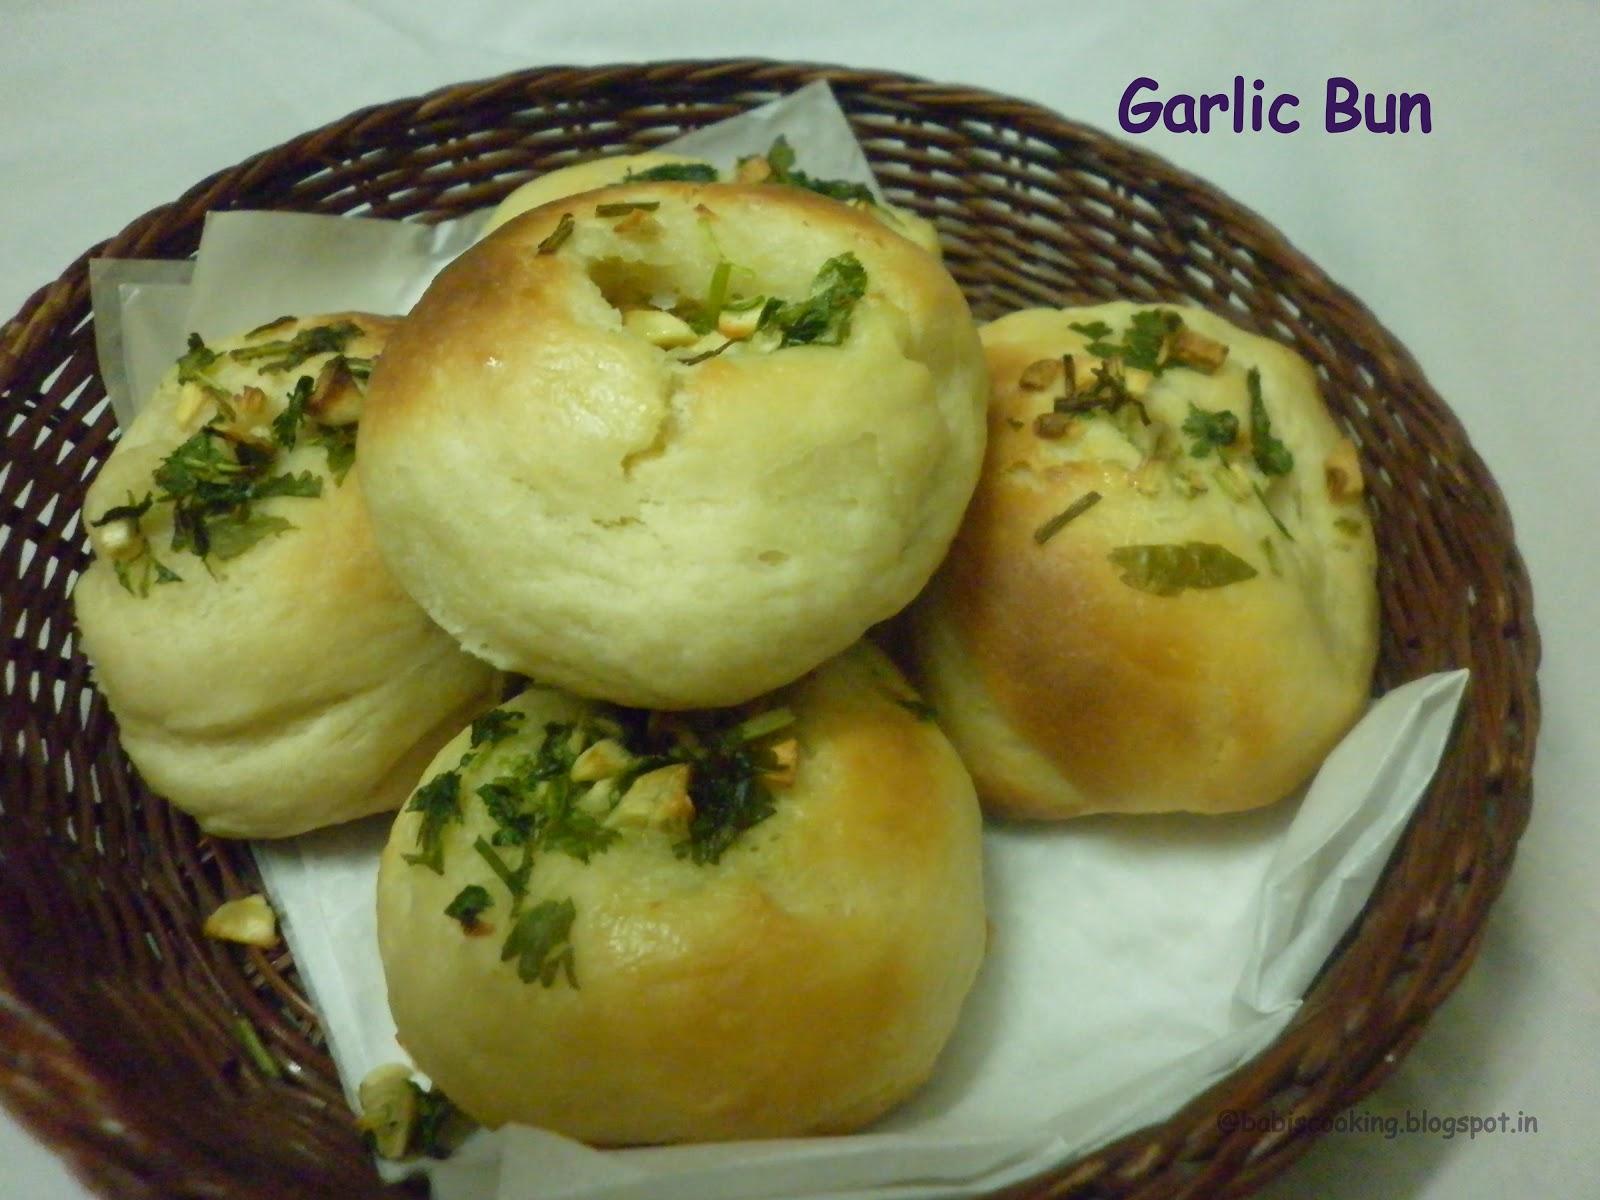 Garlic bun